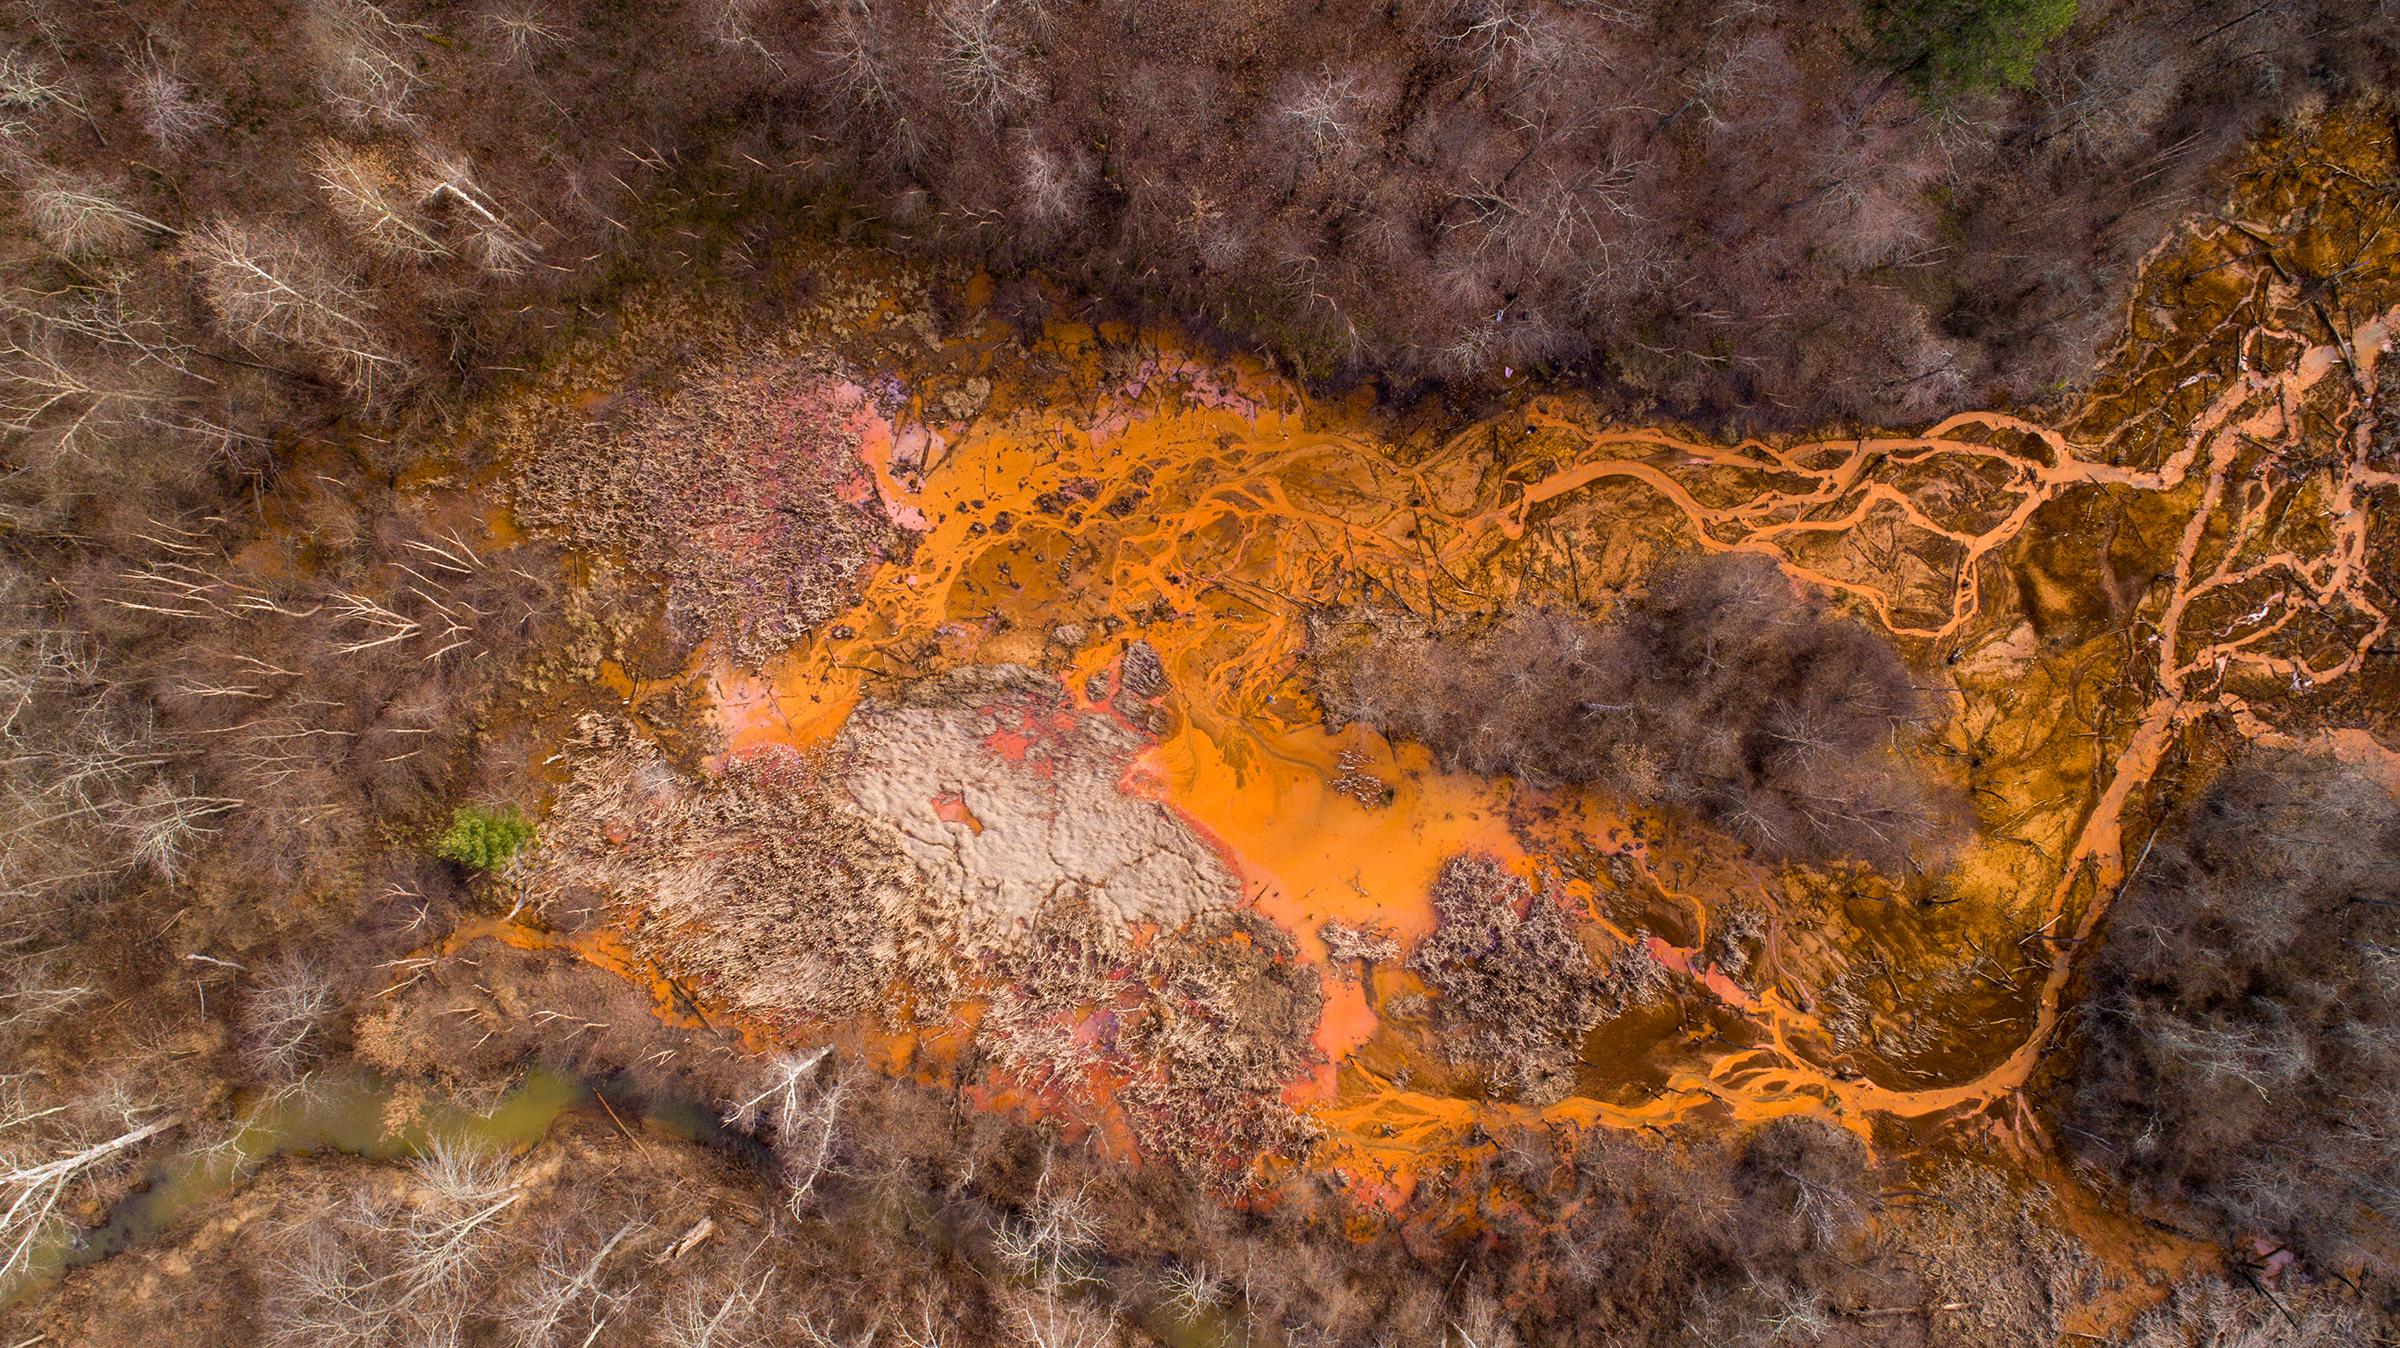 Aerial view of the acid mine drainage near Oreton, Ohio in 2018.